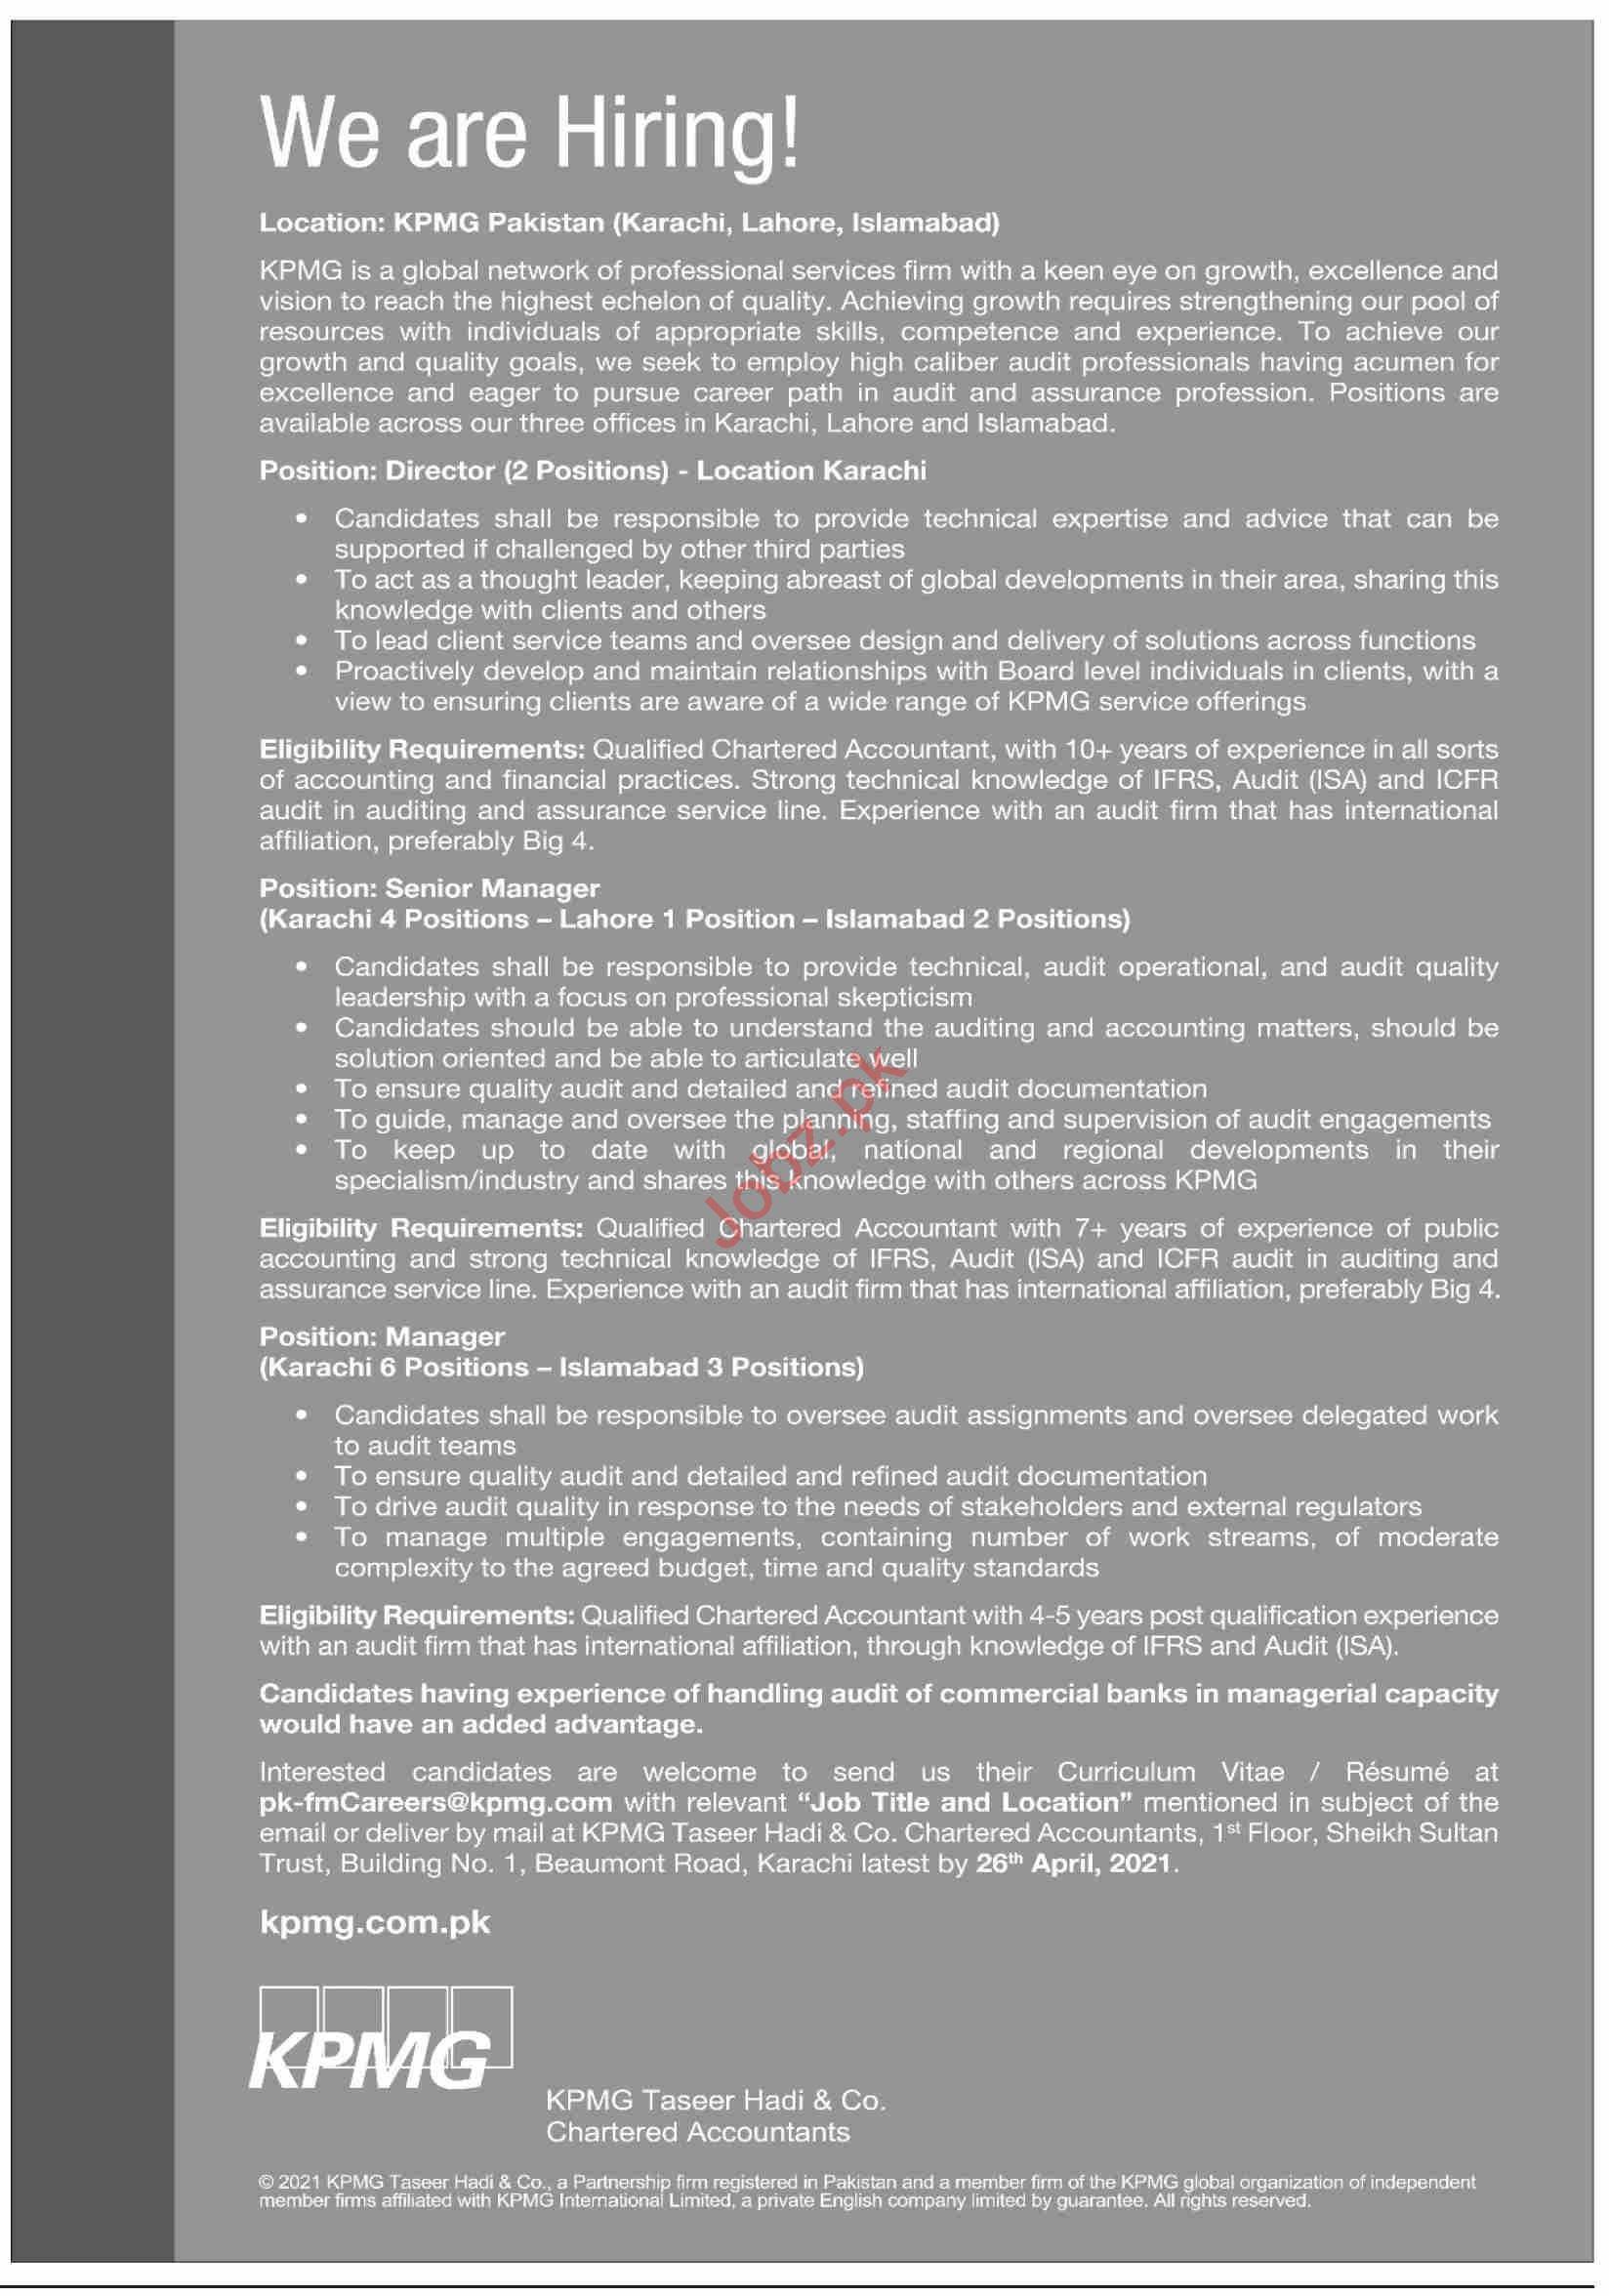 KPMG Taseer Hadi & Co Karachi Jobs 2021 for Director